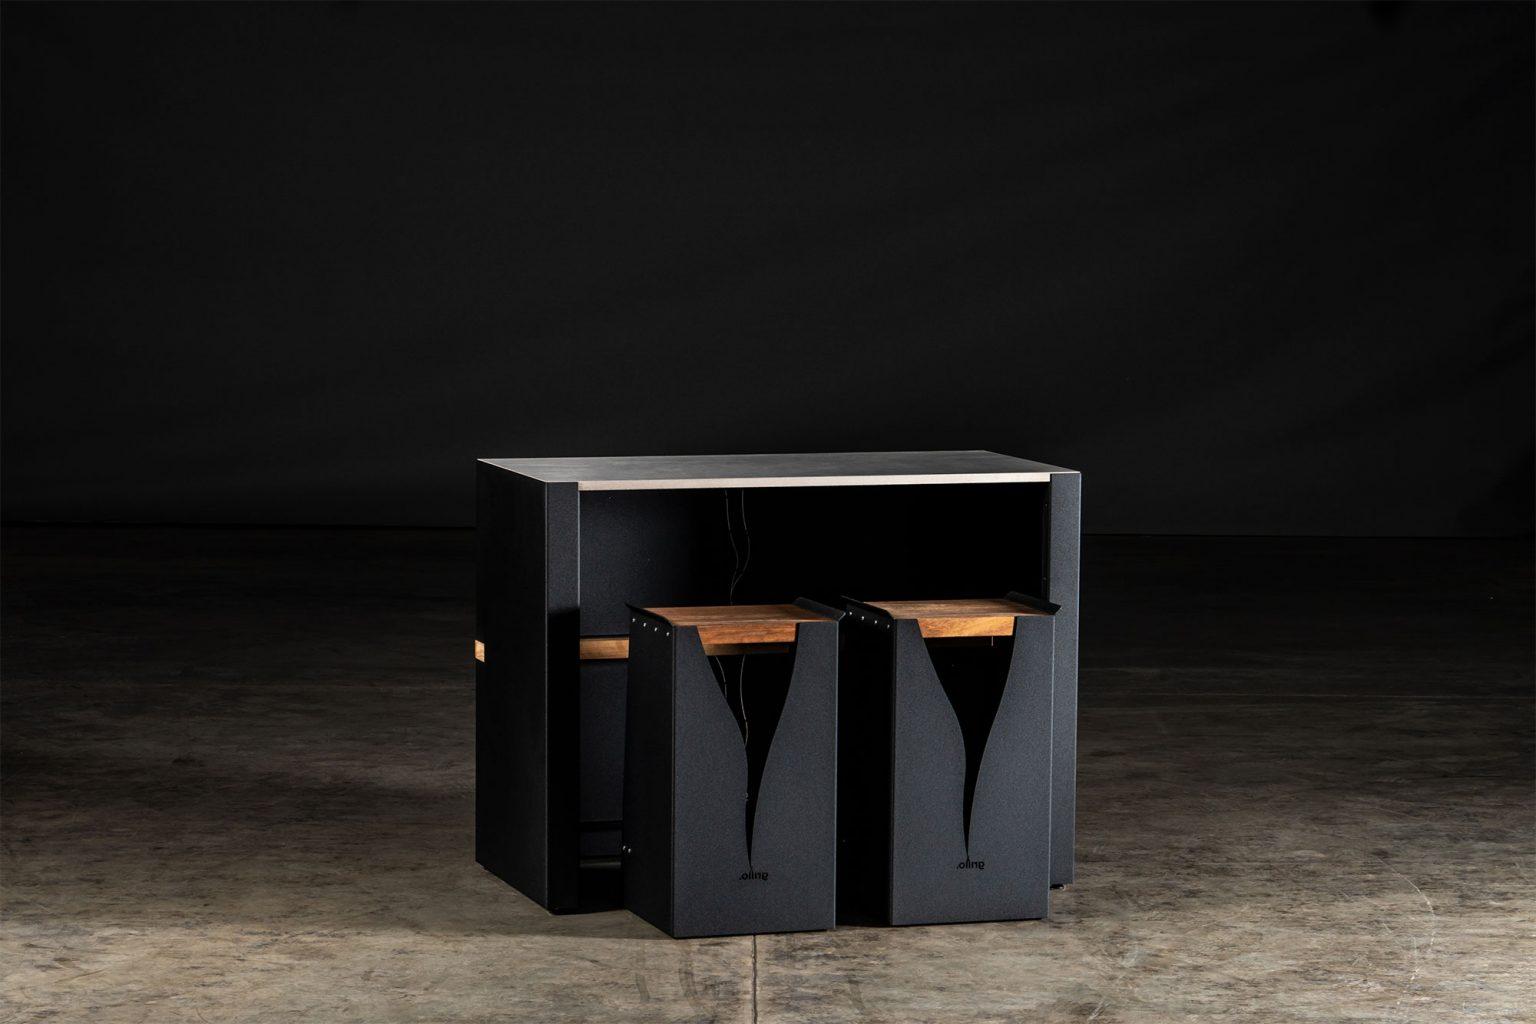 Vantage Bar Table & Stools | £1,500.00 - £2,700.00